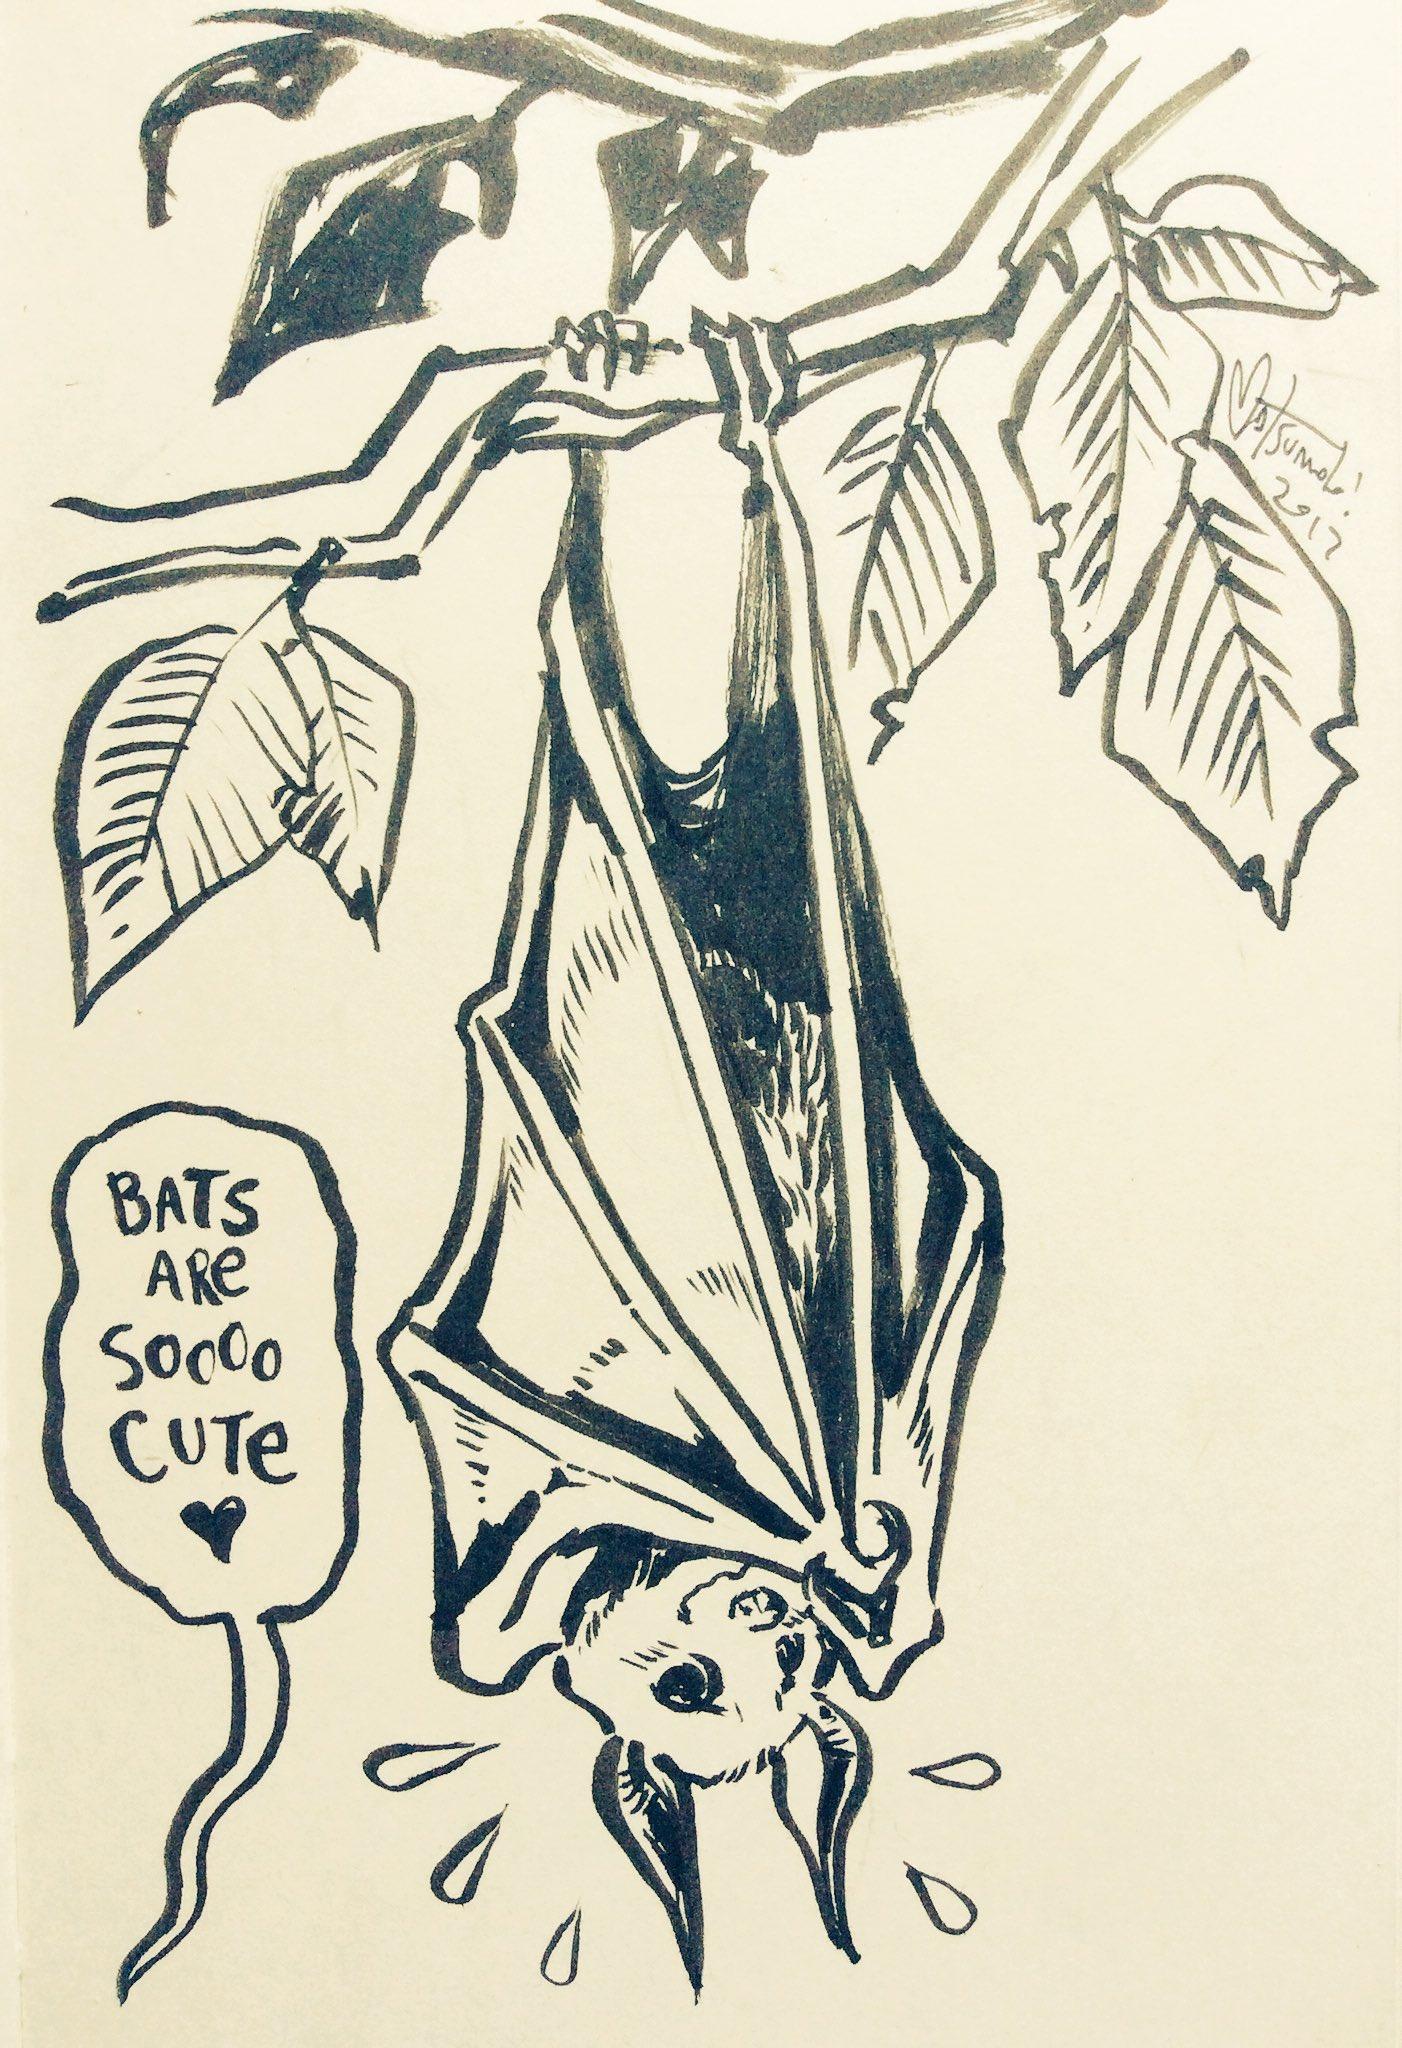 #Inktober day 7: 'shy bat' https://t.co/DMTHdJjIsE